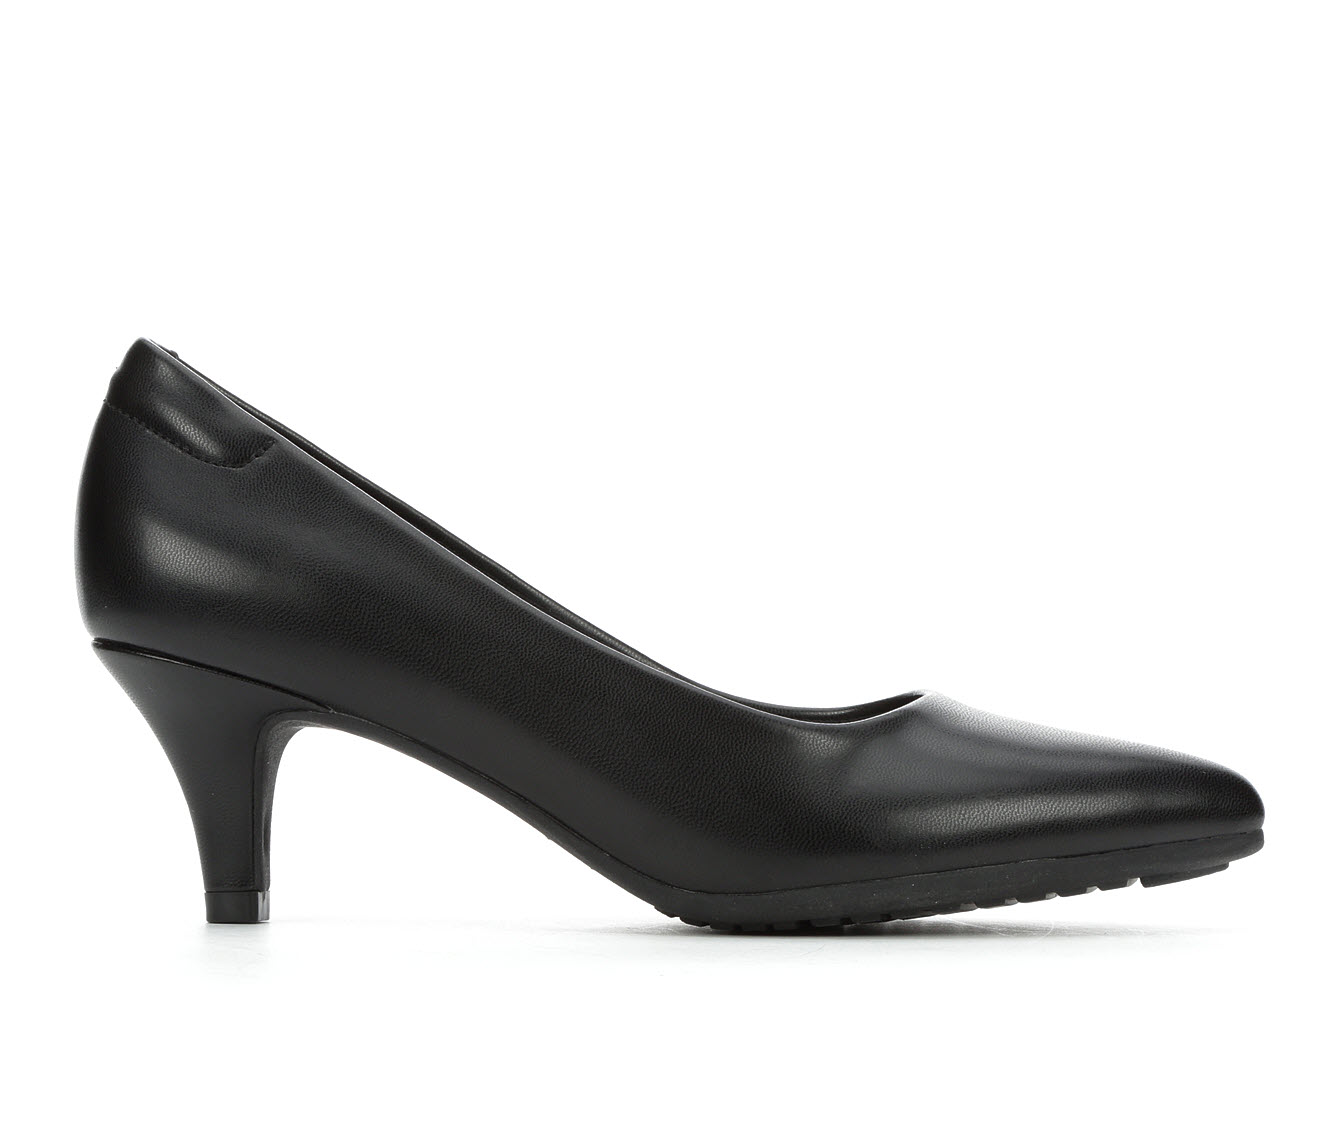 Andiamo Brenda Women's Dress Shoe (Black Faux Leather)